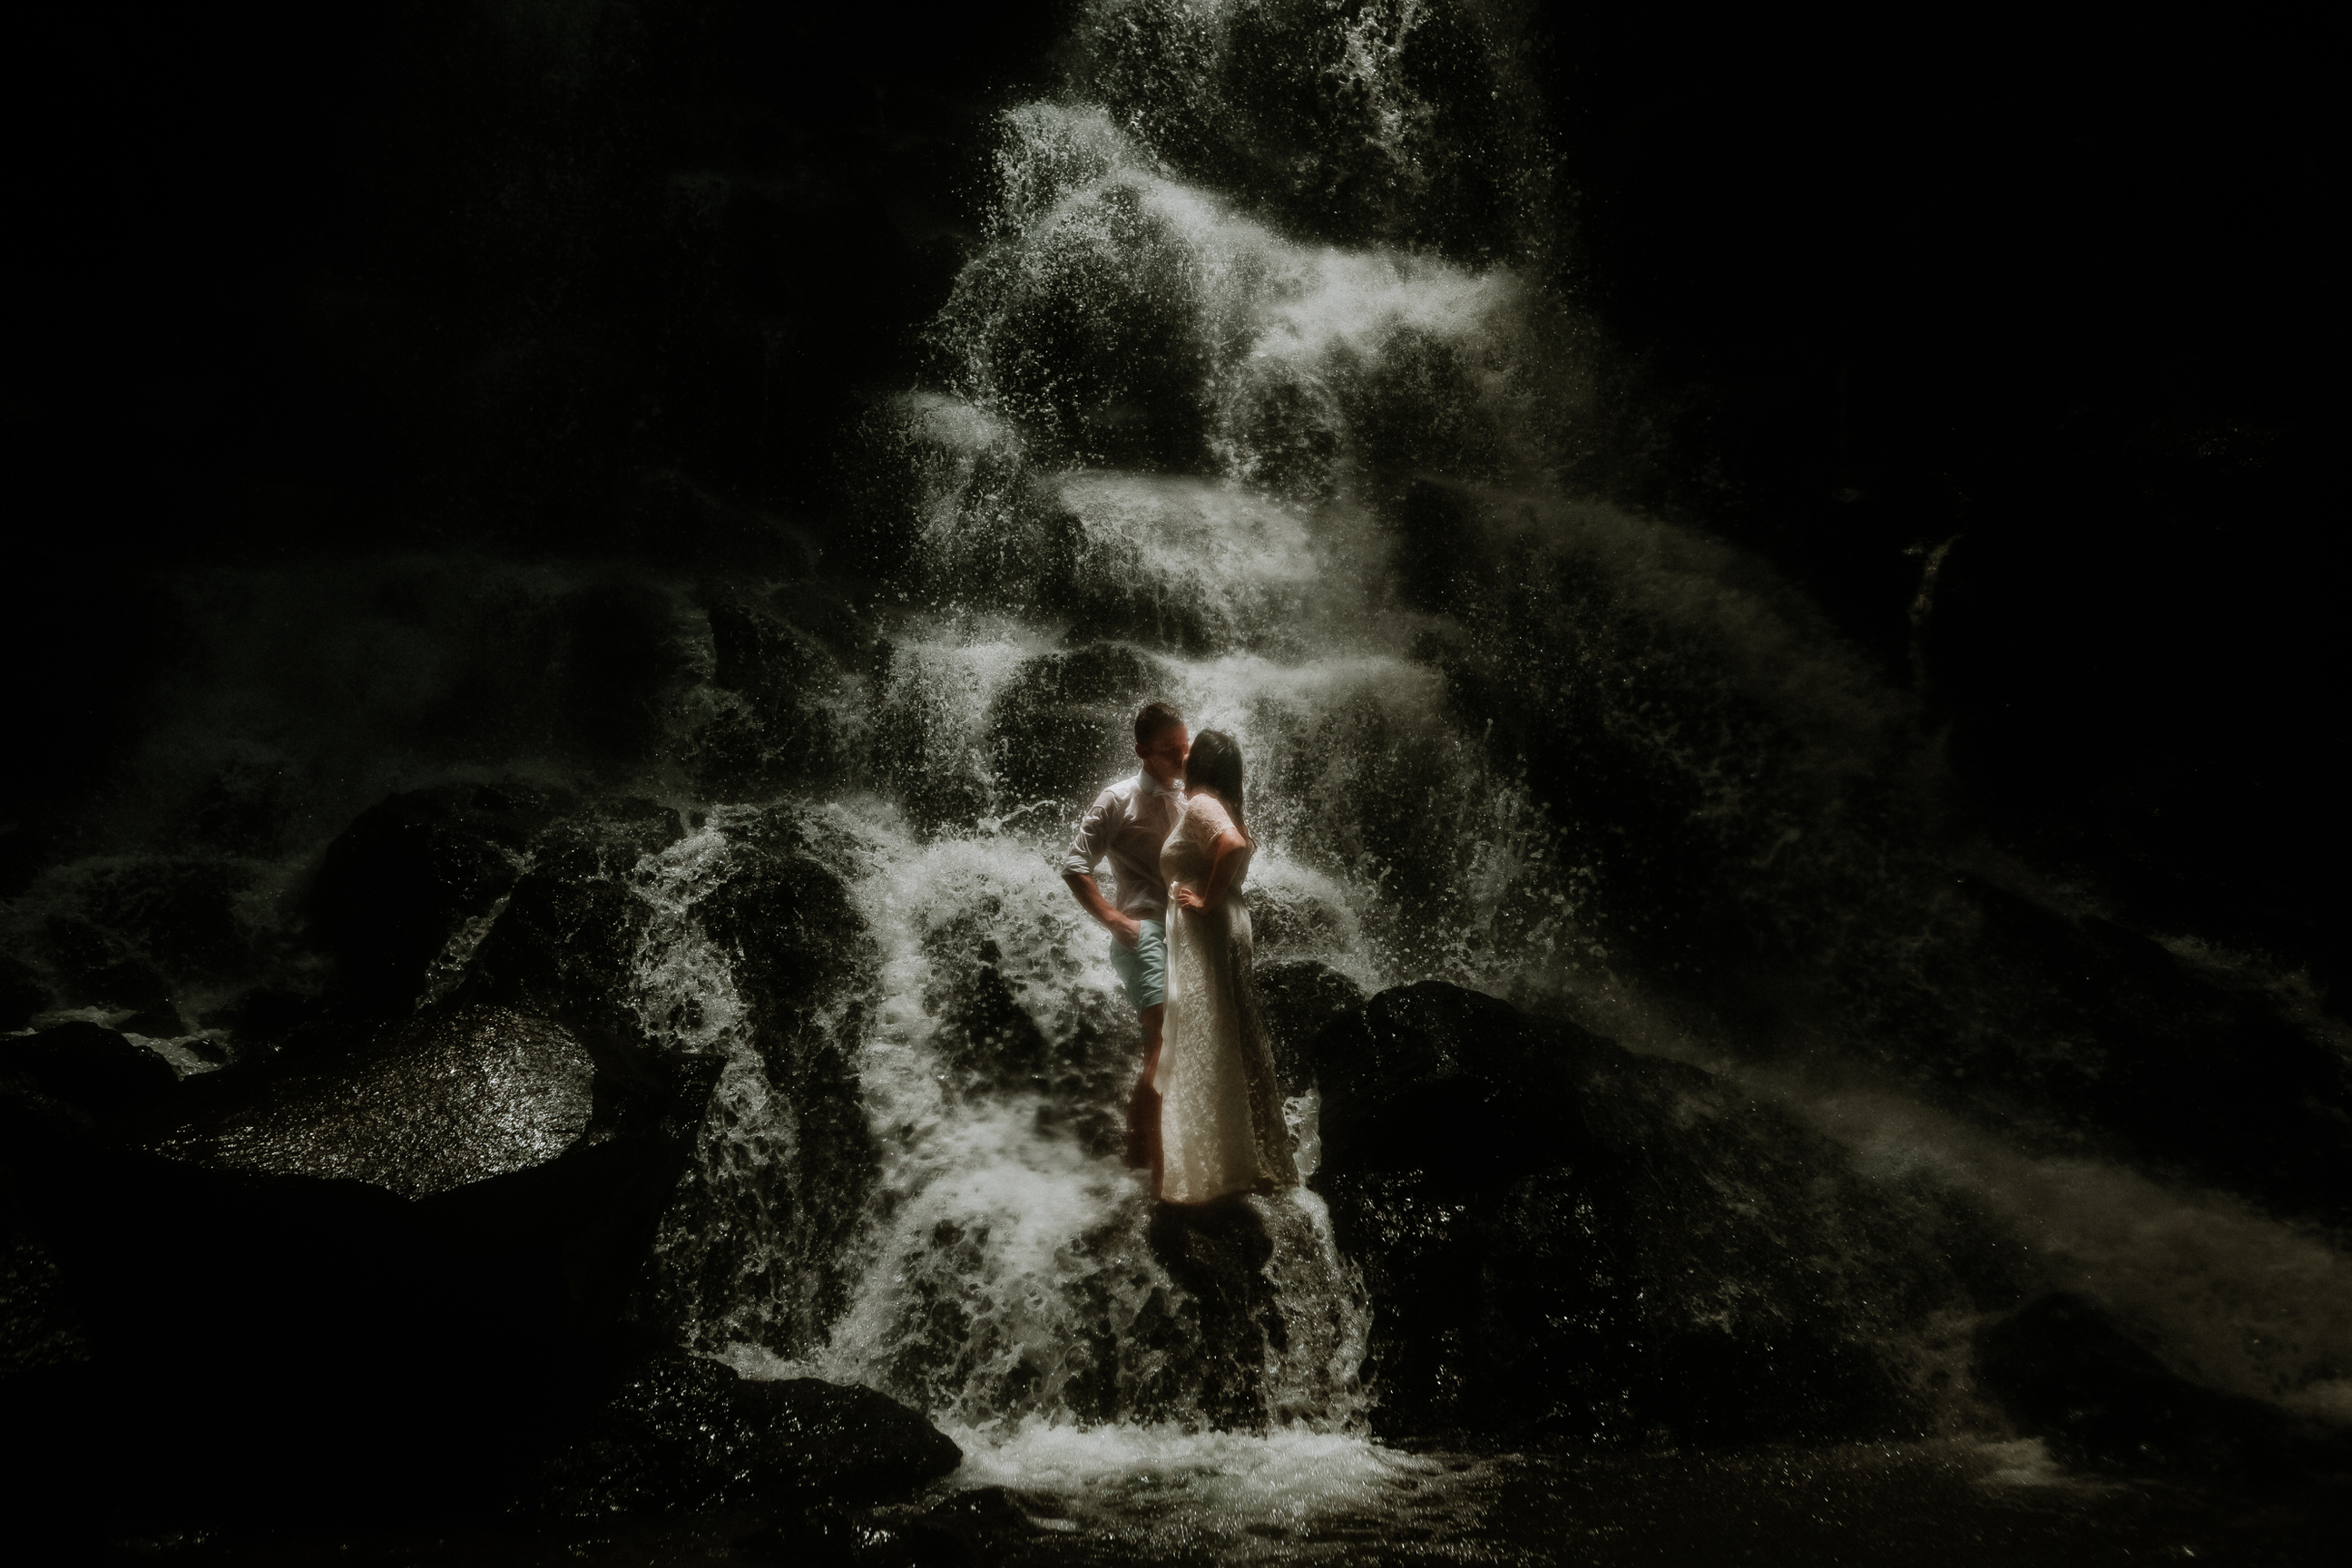 Hochzeitsfotograf Bali Sarah Töpperwien